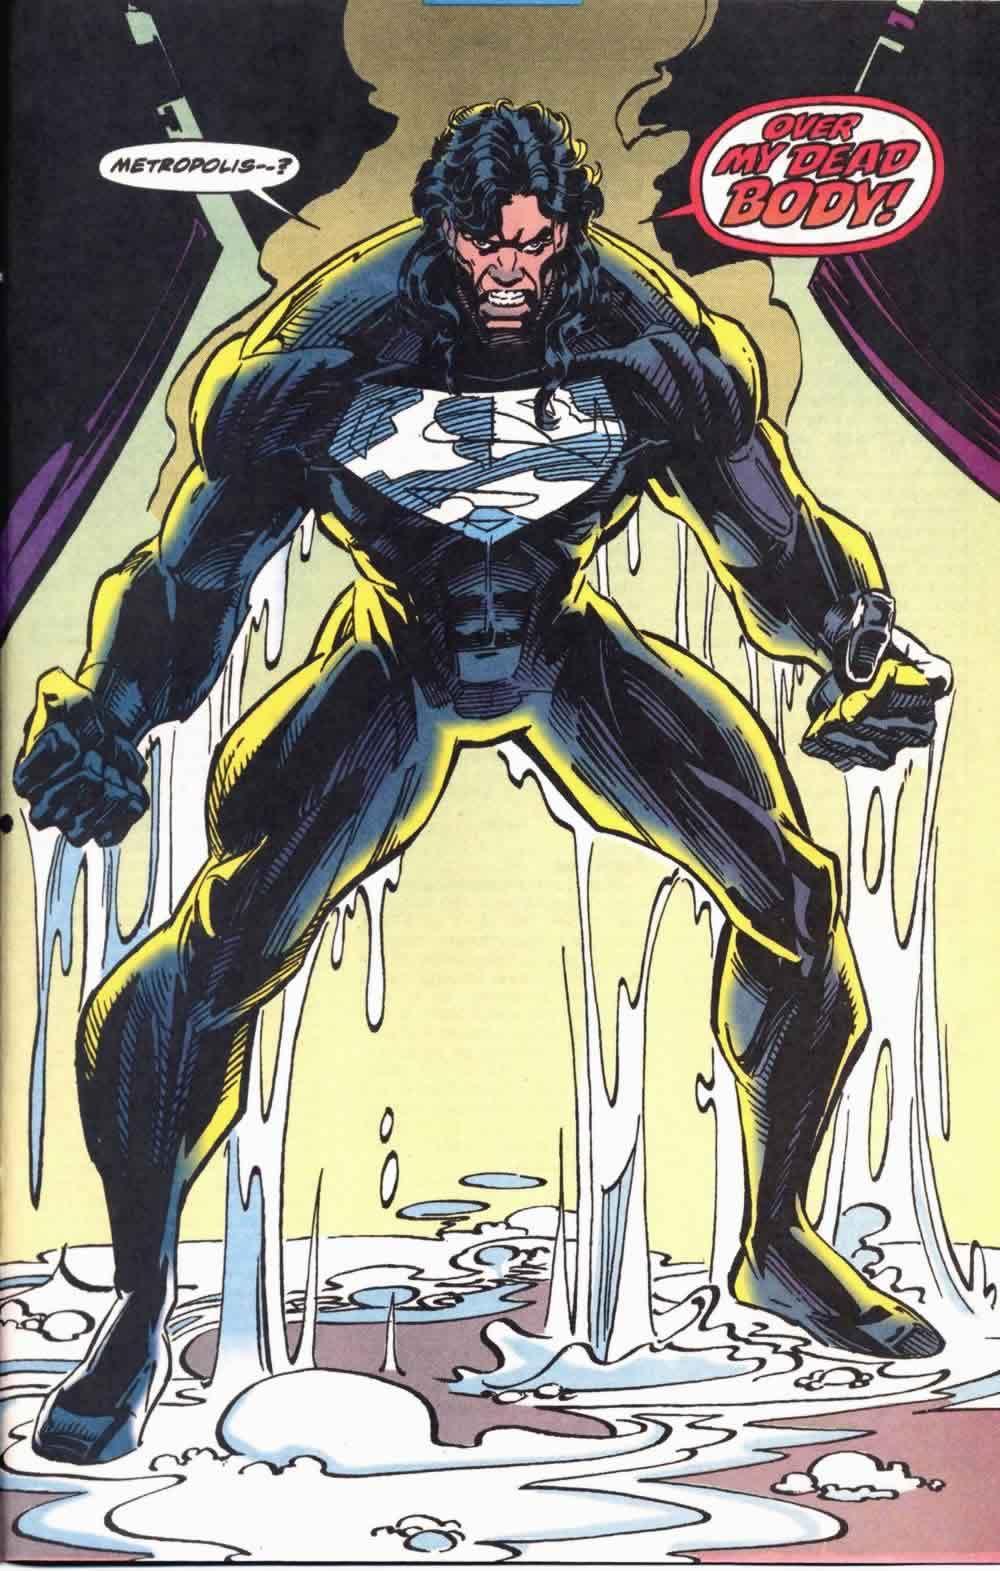 Superman vistiendo la armadura kryptoniana en Superman: The Man of Steel #25 (septiembre de 1993). Arte por Jon Bogdanove. Imagen: Graded Key Comics